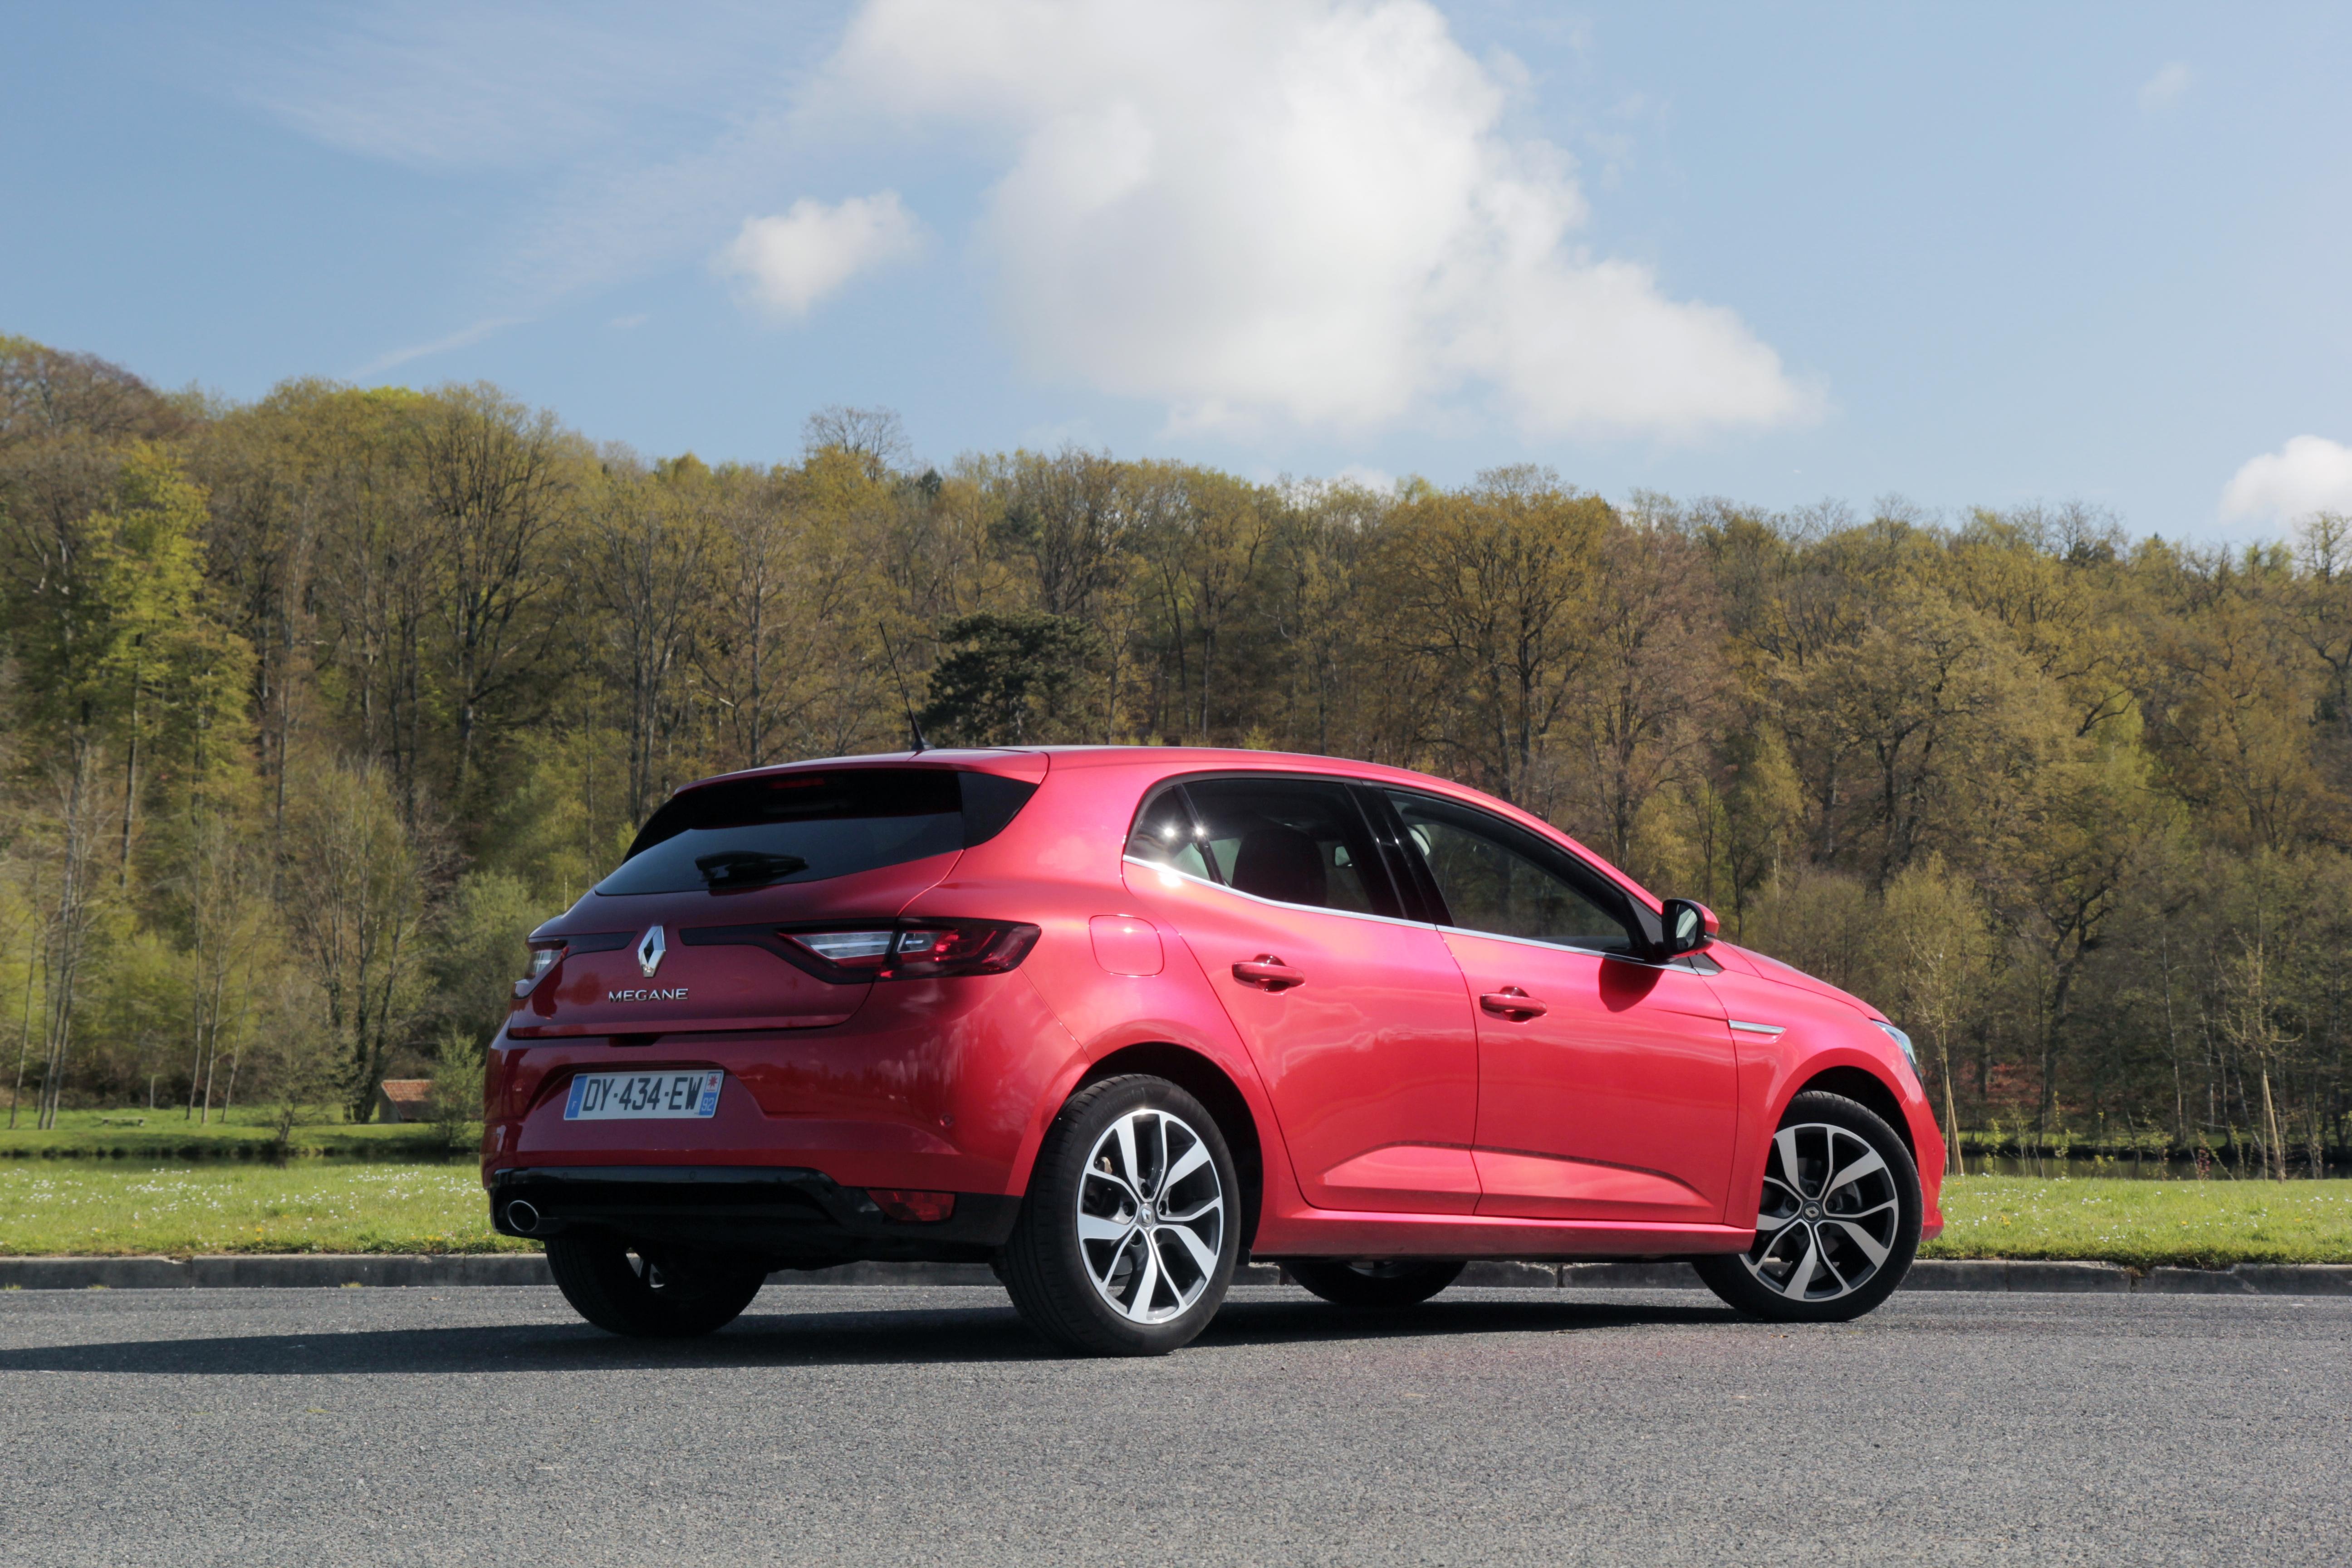 Comparativa: Opel Astra VS Renault Megane VS Volkswagen Golf  S0-comparatif-video-renault-megane-vs-opel-astra-vs-volkswagen-golf-la-deuxieme-tentative-sera-t-elle-la-bonne-378199